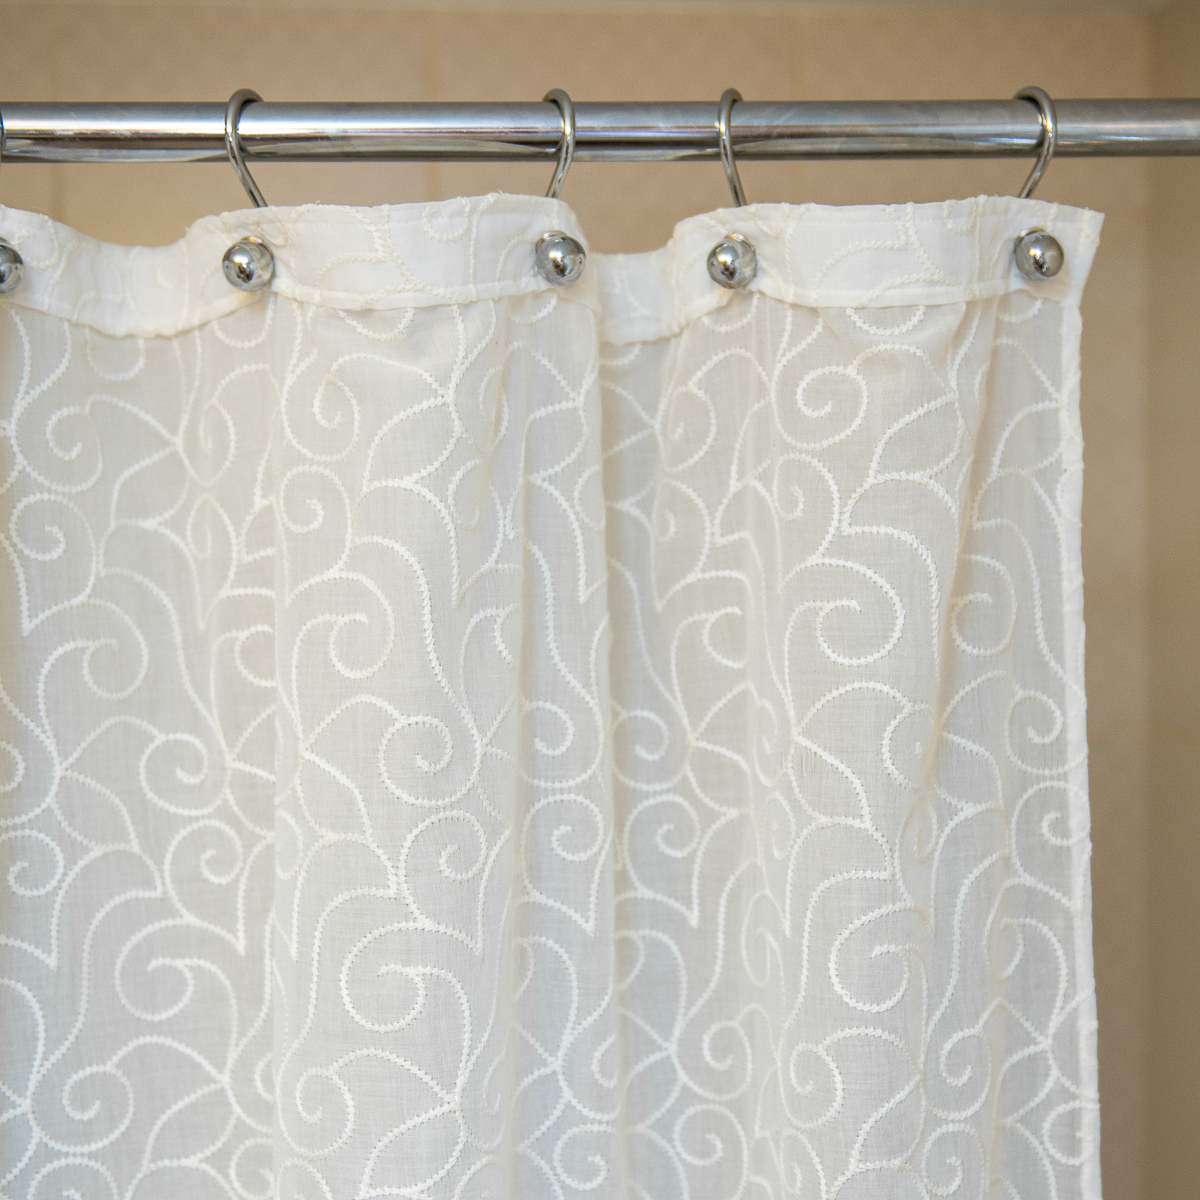 Шторки Шторка для ванной 180х200 Arti-Deco Embroidery 2555 elitnaya-shtorka-dlya-vannoy-180h200-embroidery-2555-ot-arti-deco-ispaniya.jpg